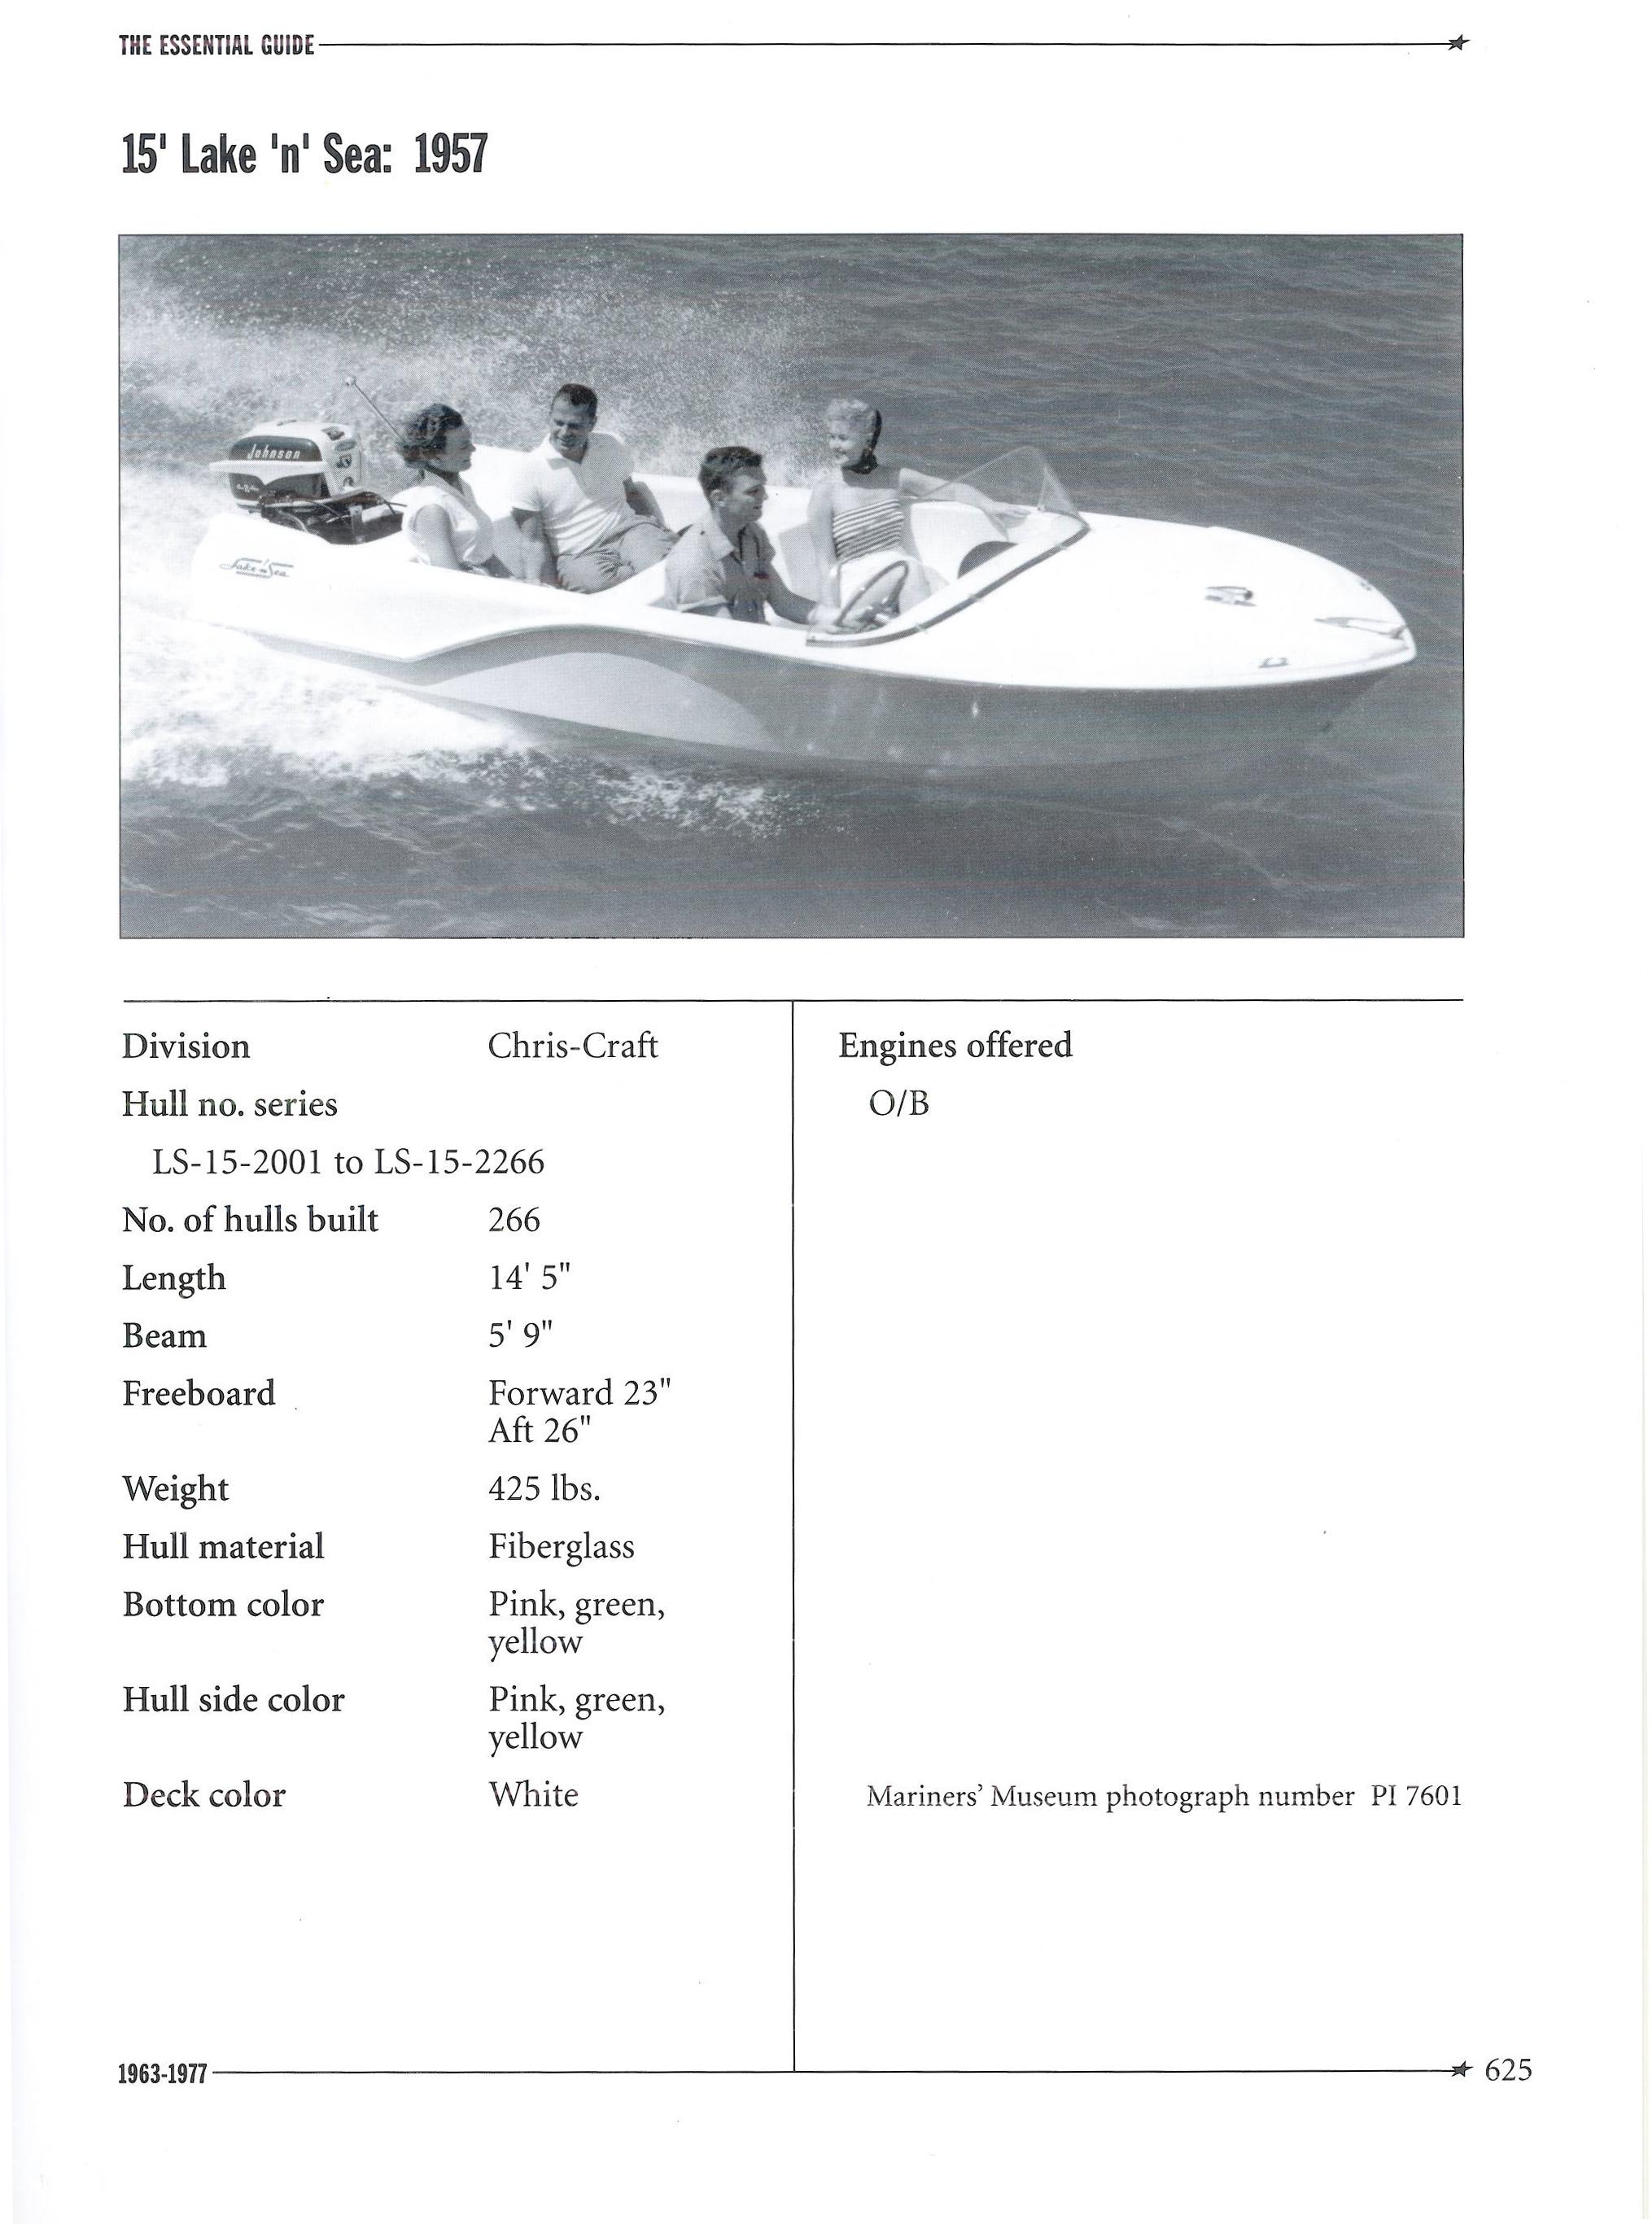 chris-craft-lake-n-sea-15-pleasure-runabout-chris-craft-the-essential-guide